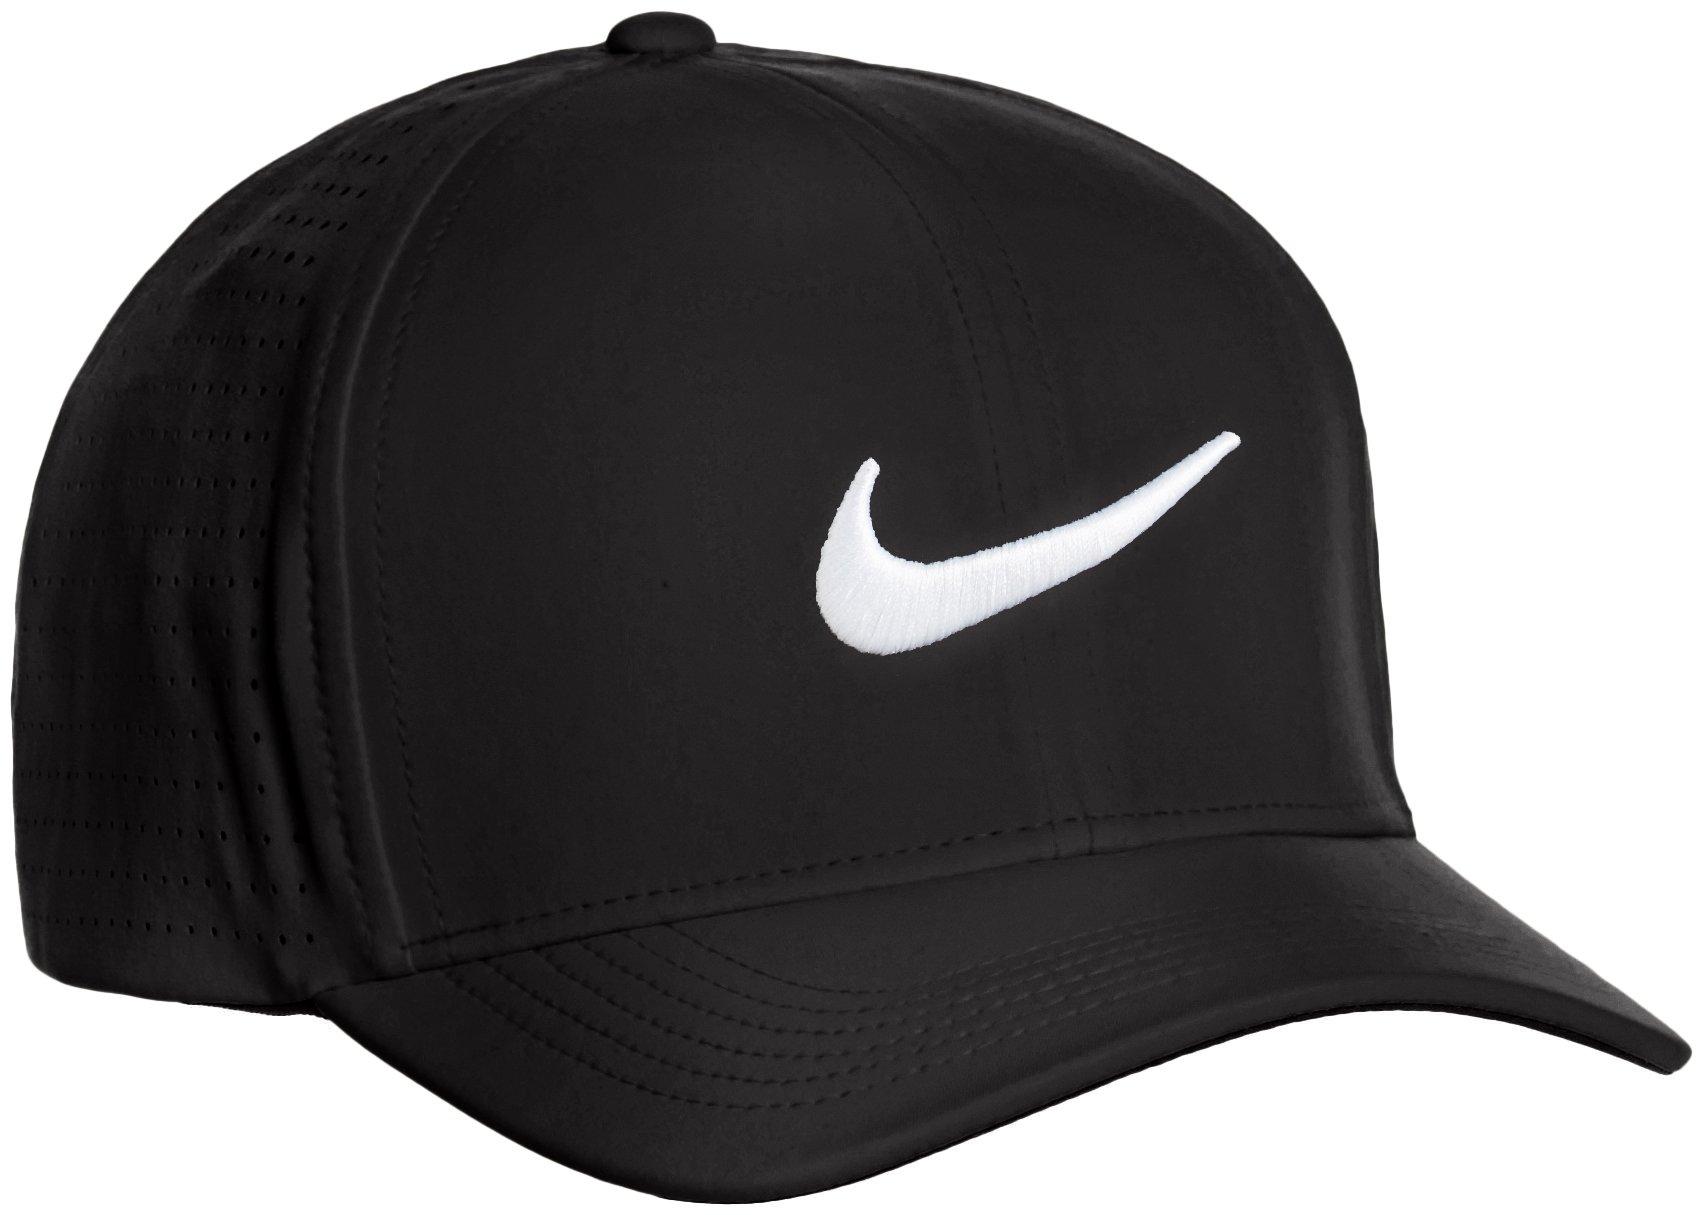 7792a1ca6f522 Nike Men's Classic 99 Fitted Golf Hat, Black, Small/Medium